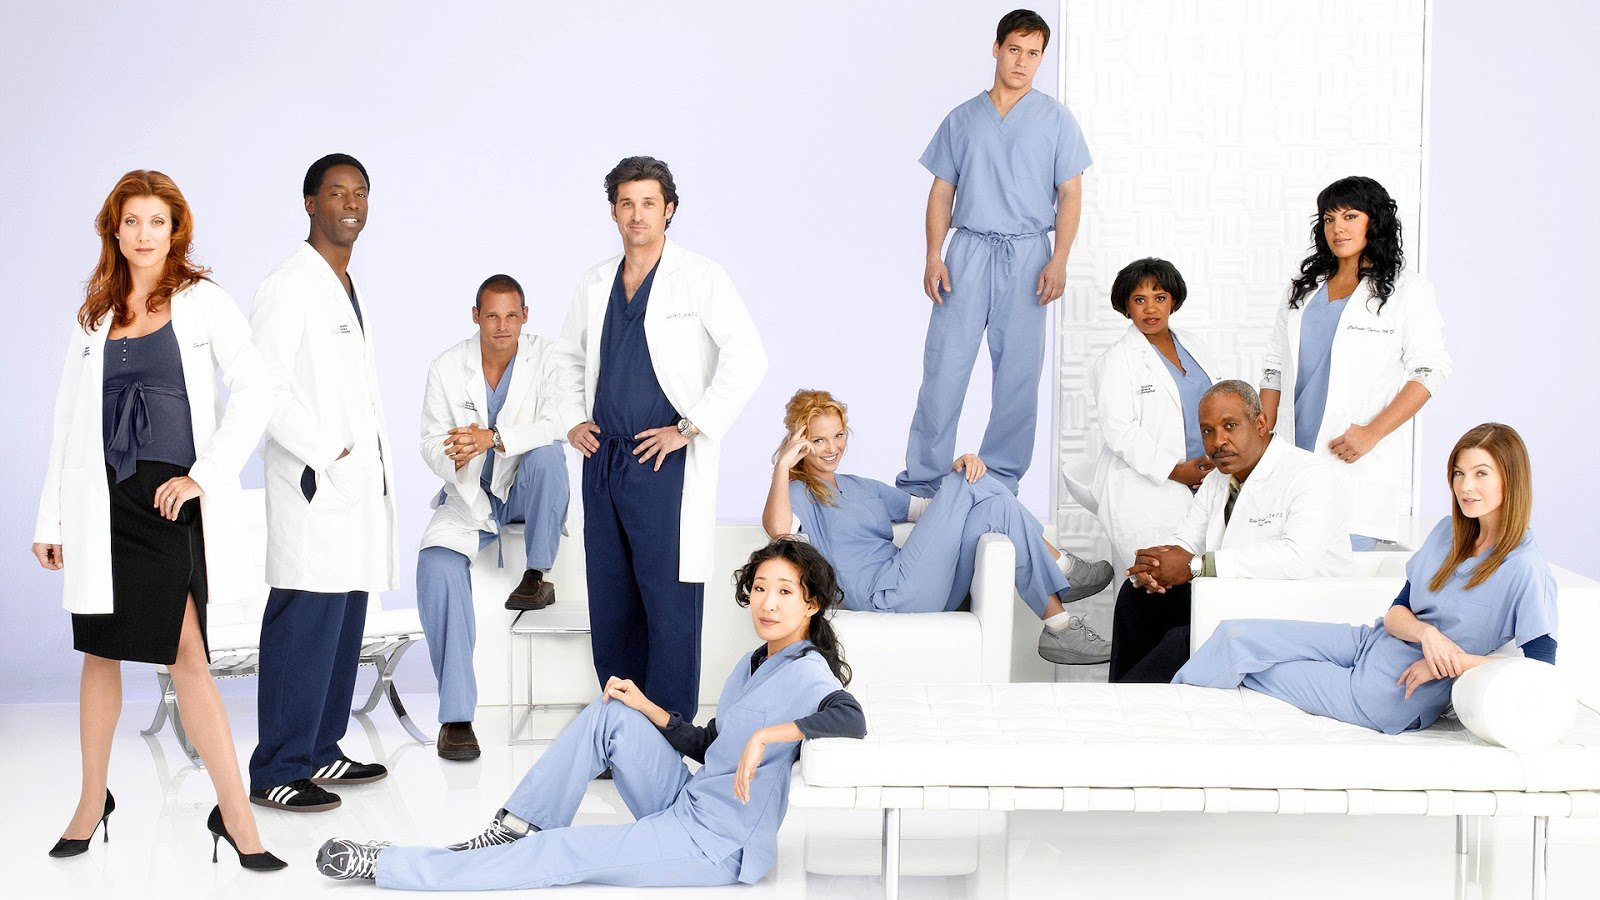 Greys Anatomy Season 15 Episode 8 Blowin In The Wind